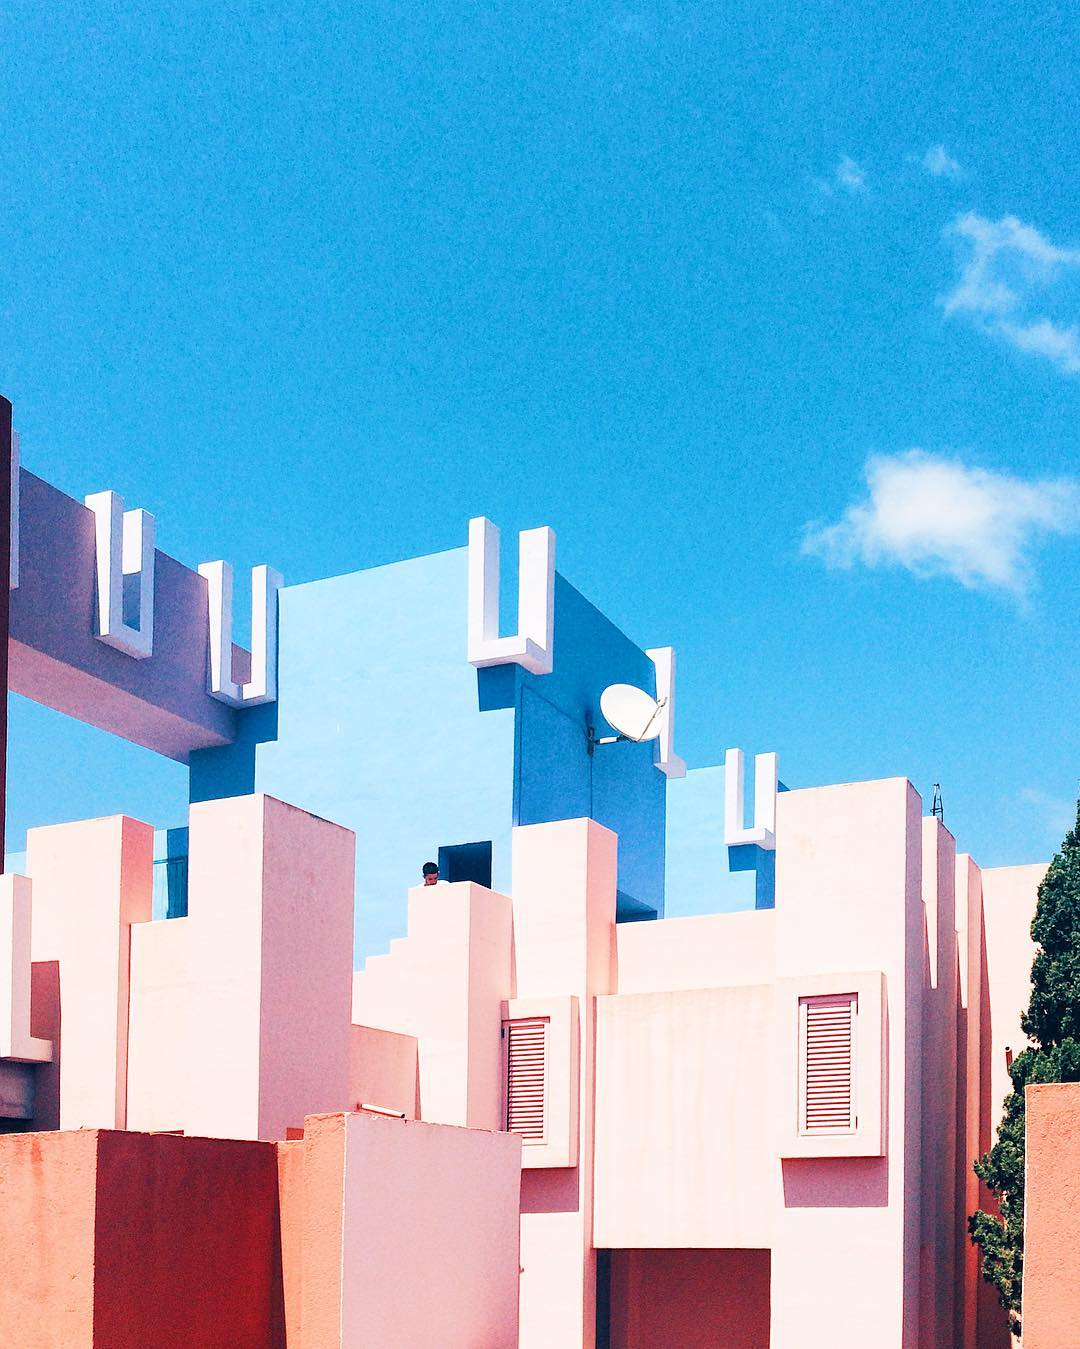 fotografo Joaquin Lucas paleta de colores de Wes Anderson  (37)